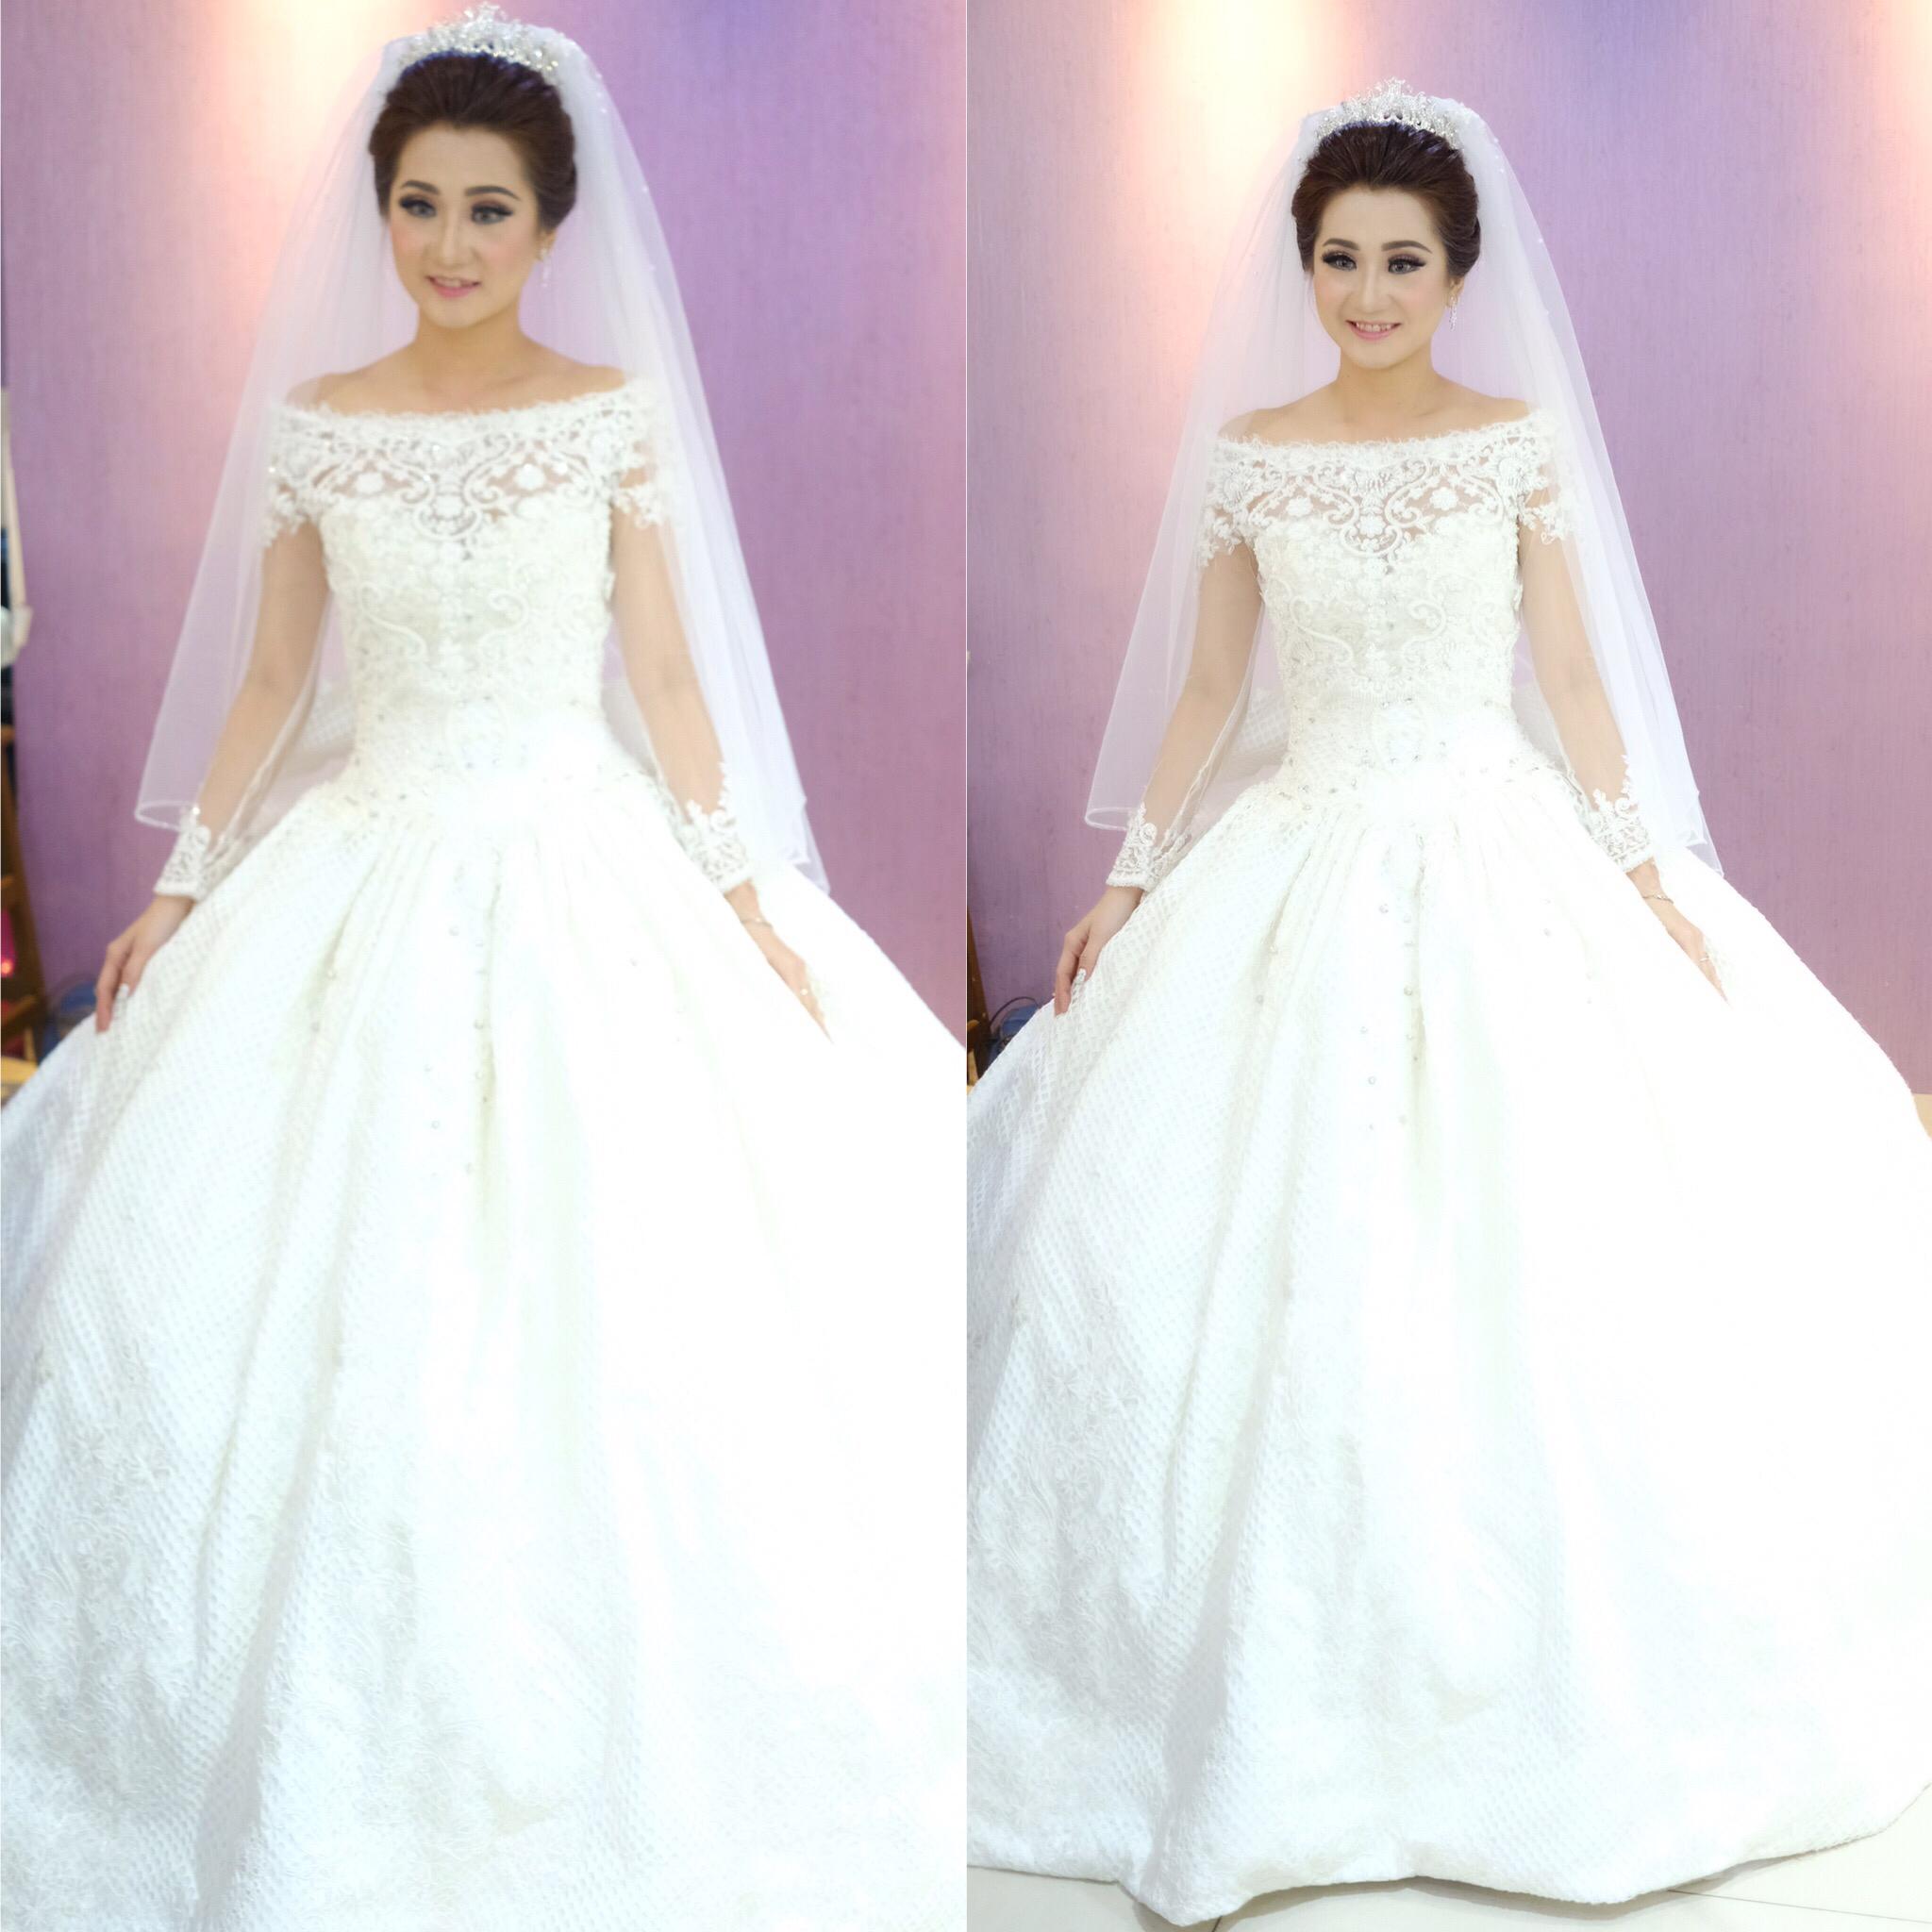 Sansan Bridal Wedding Bridal In Jakarta Bridestory Com